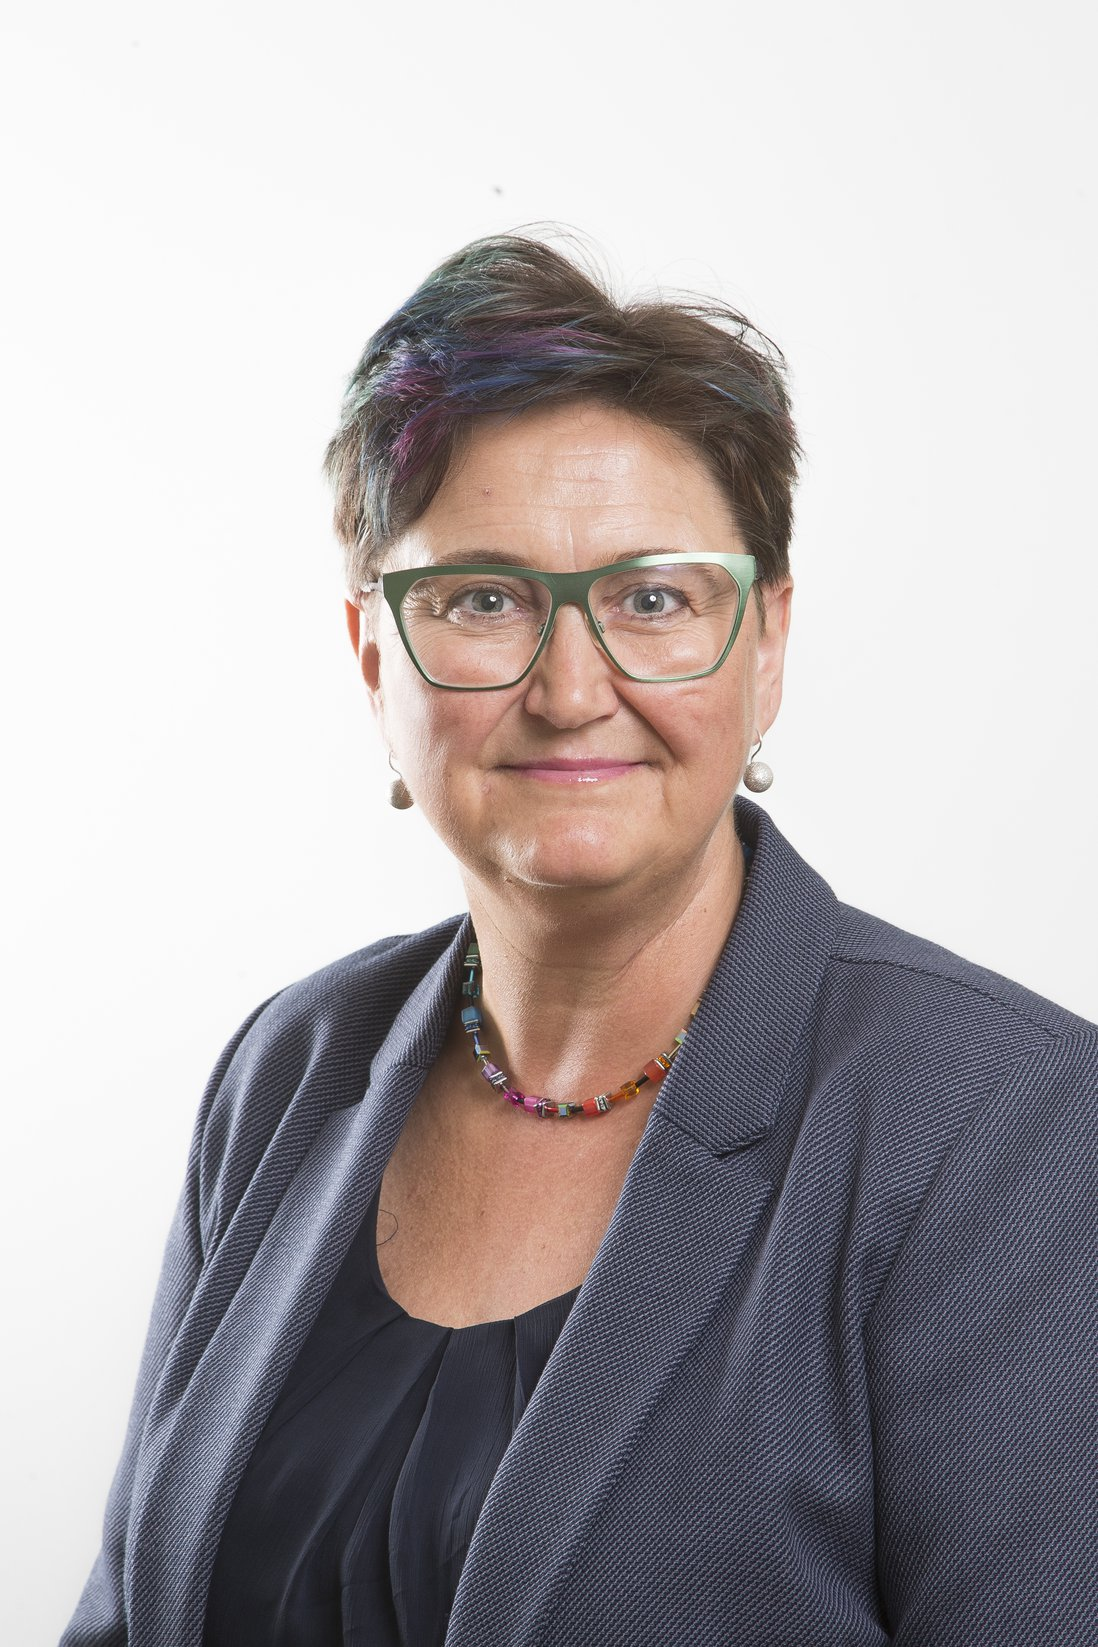 Kari Midtbø Kristiansen